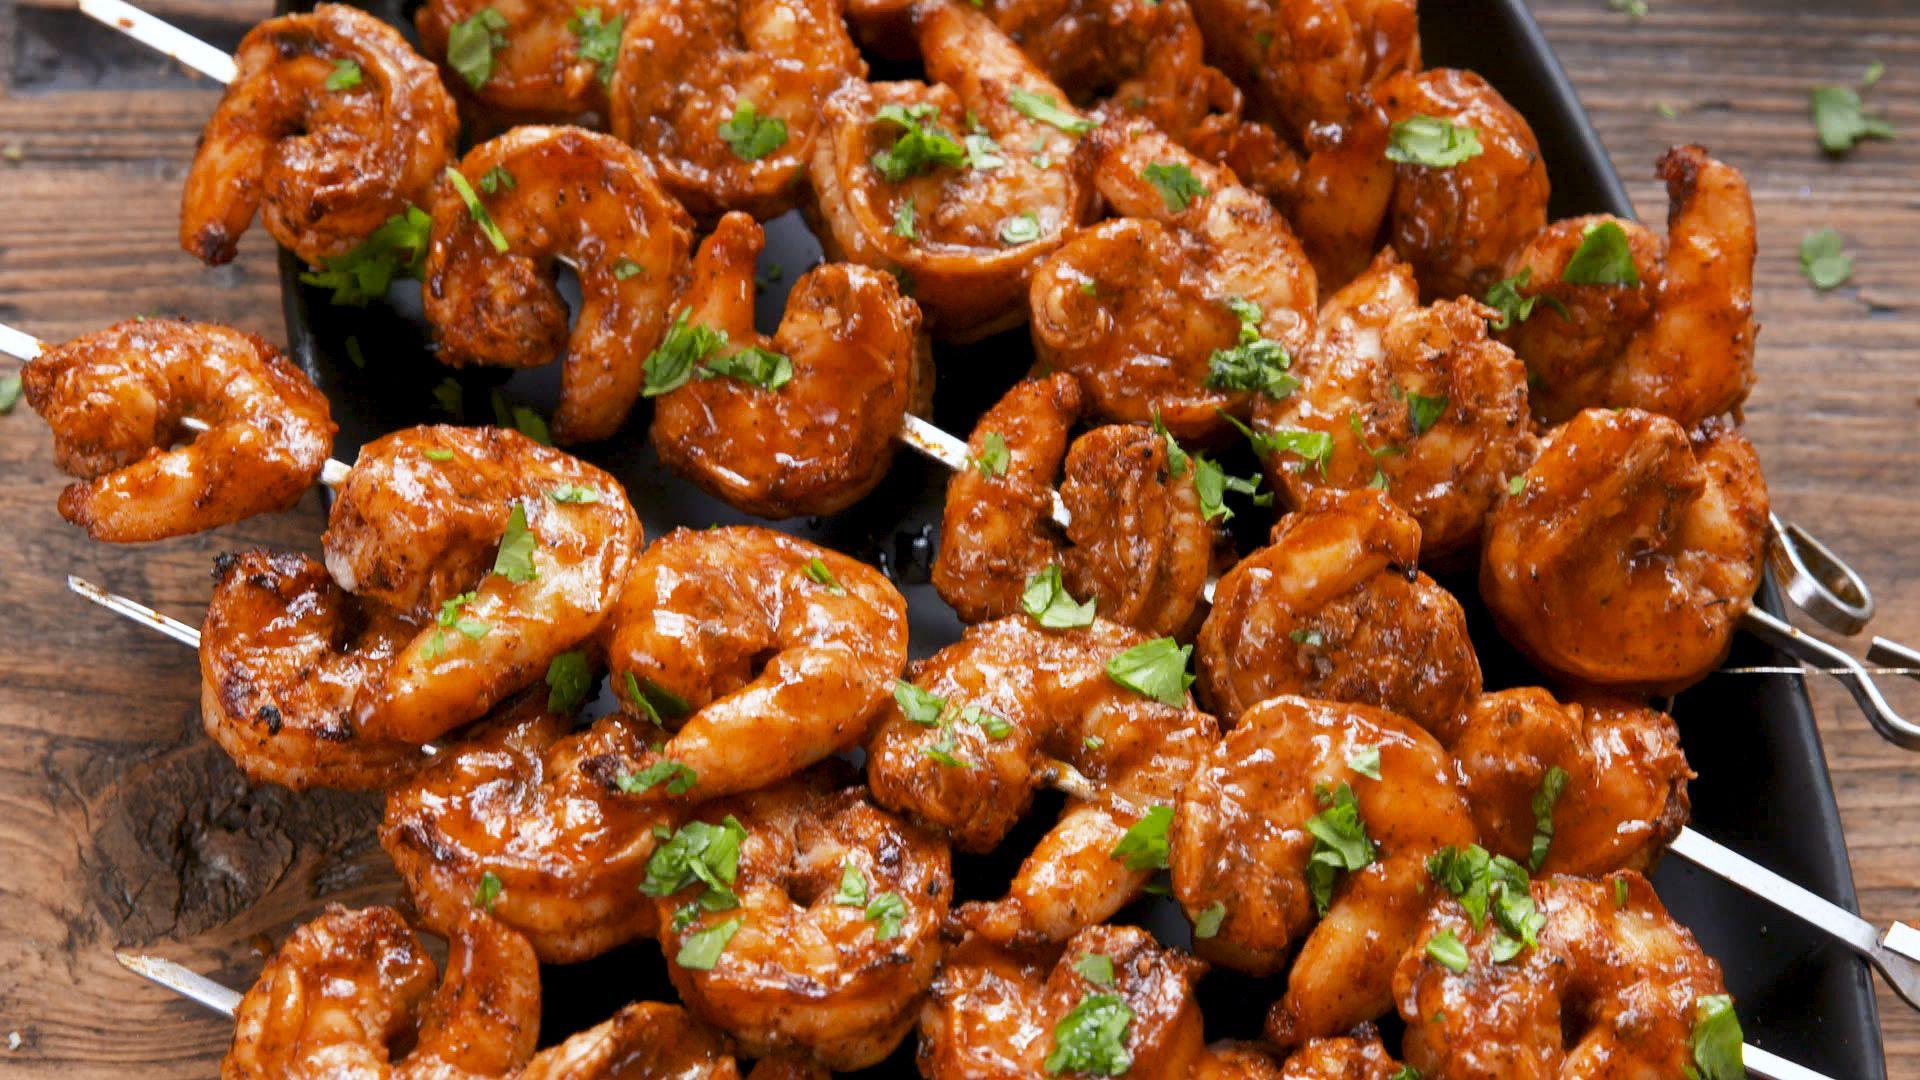 70 Easy Shrimp Recipes Best Quick Dinner Ideas For Cooking Shrimp